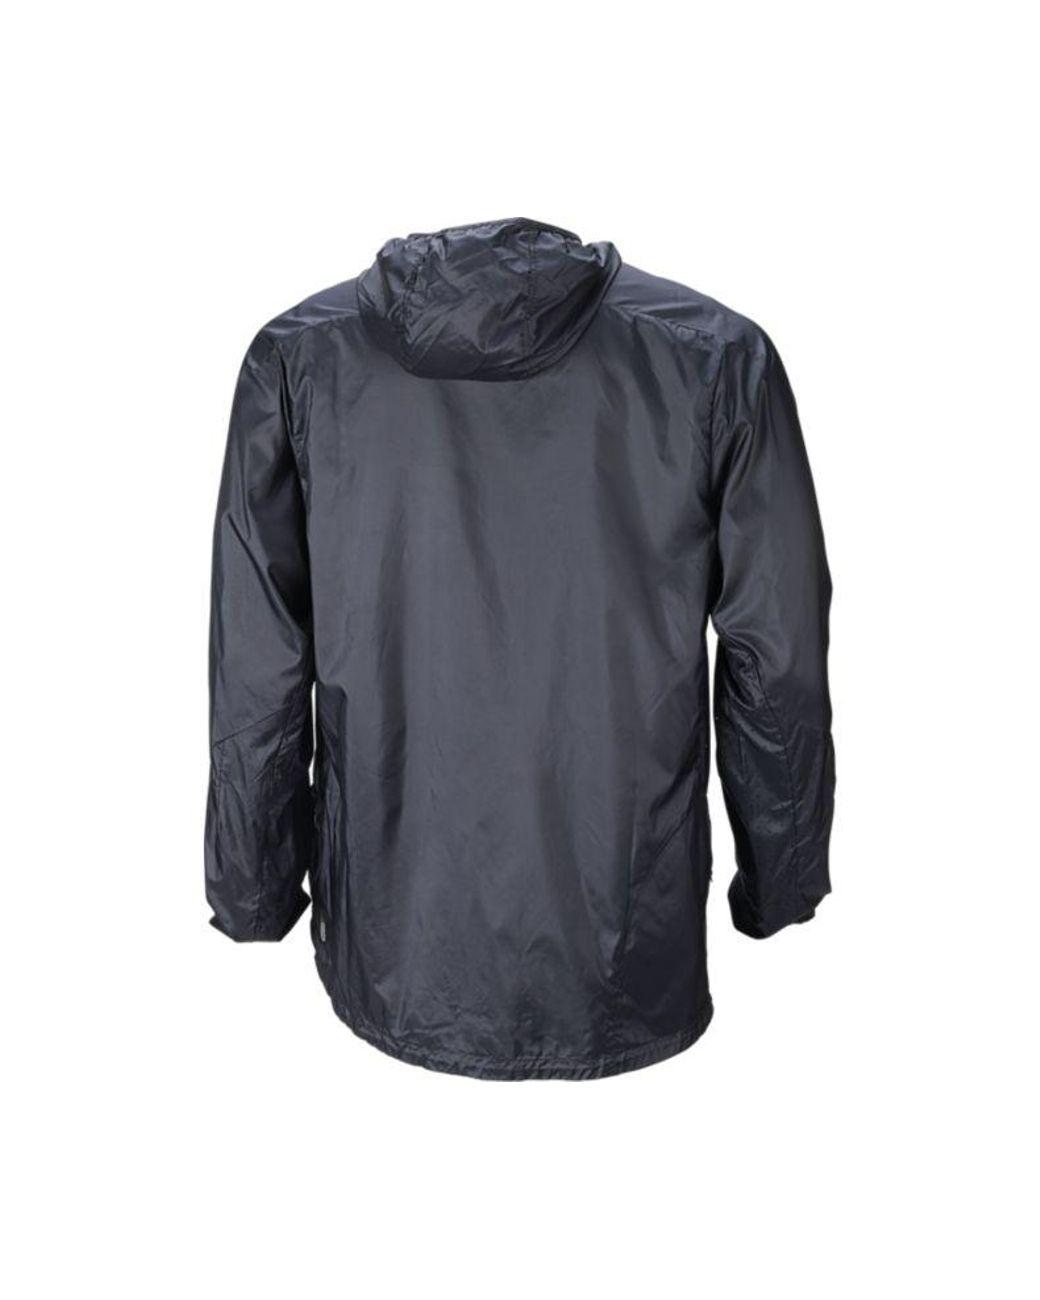 785d45e86b Men's Black Torrent Windbreaker Jacket